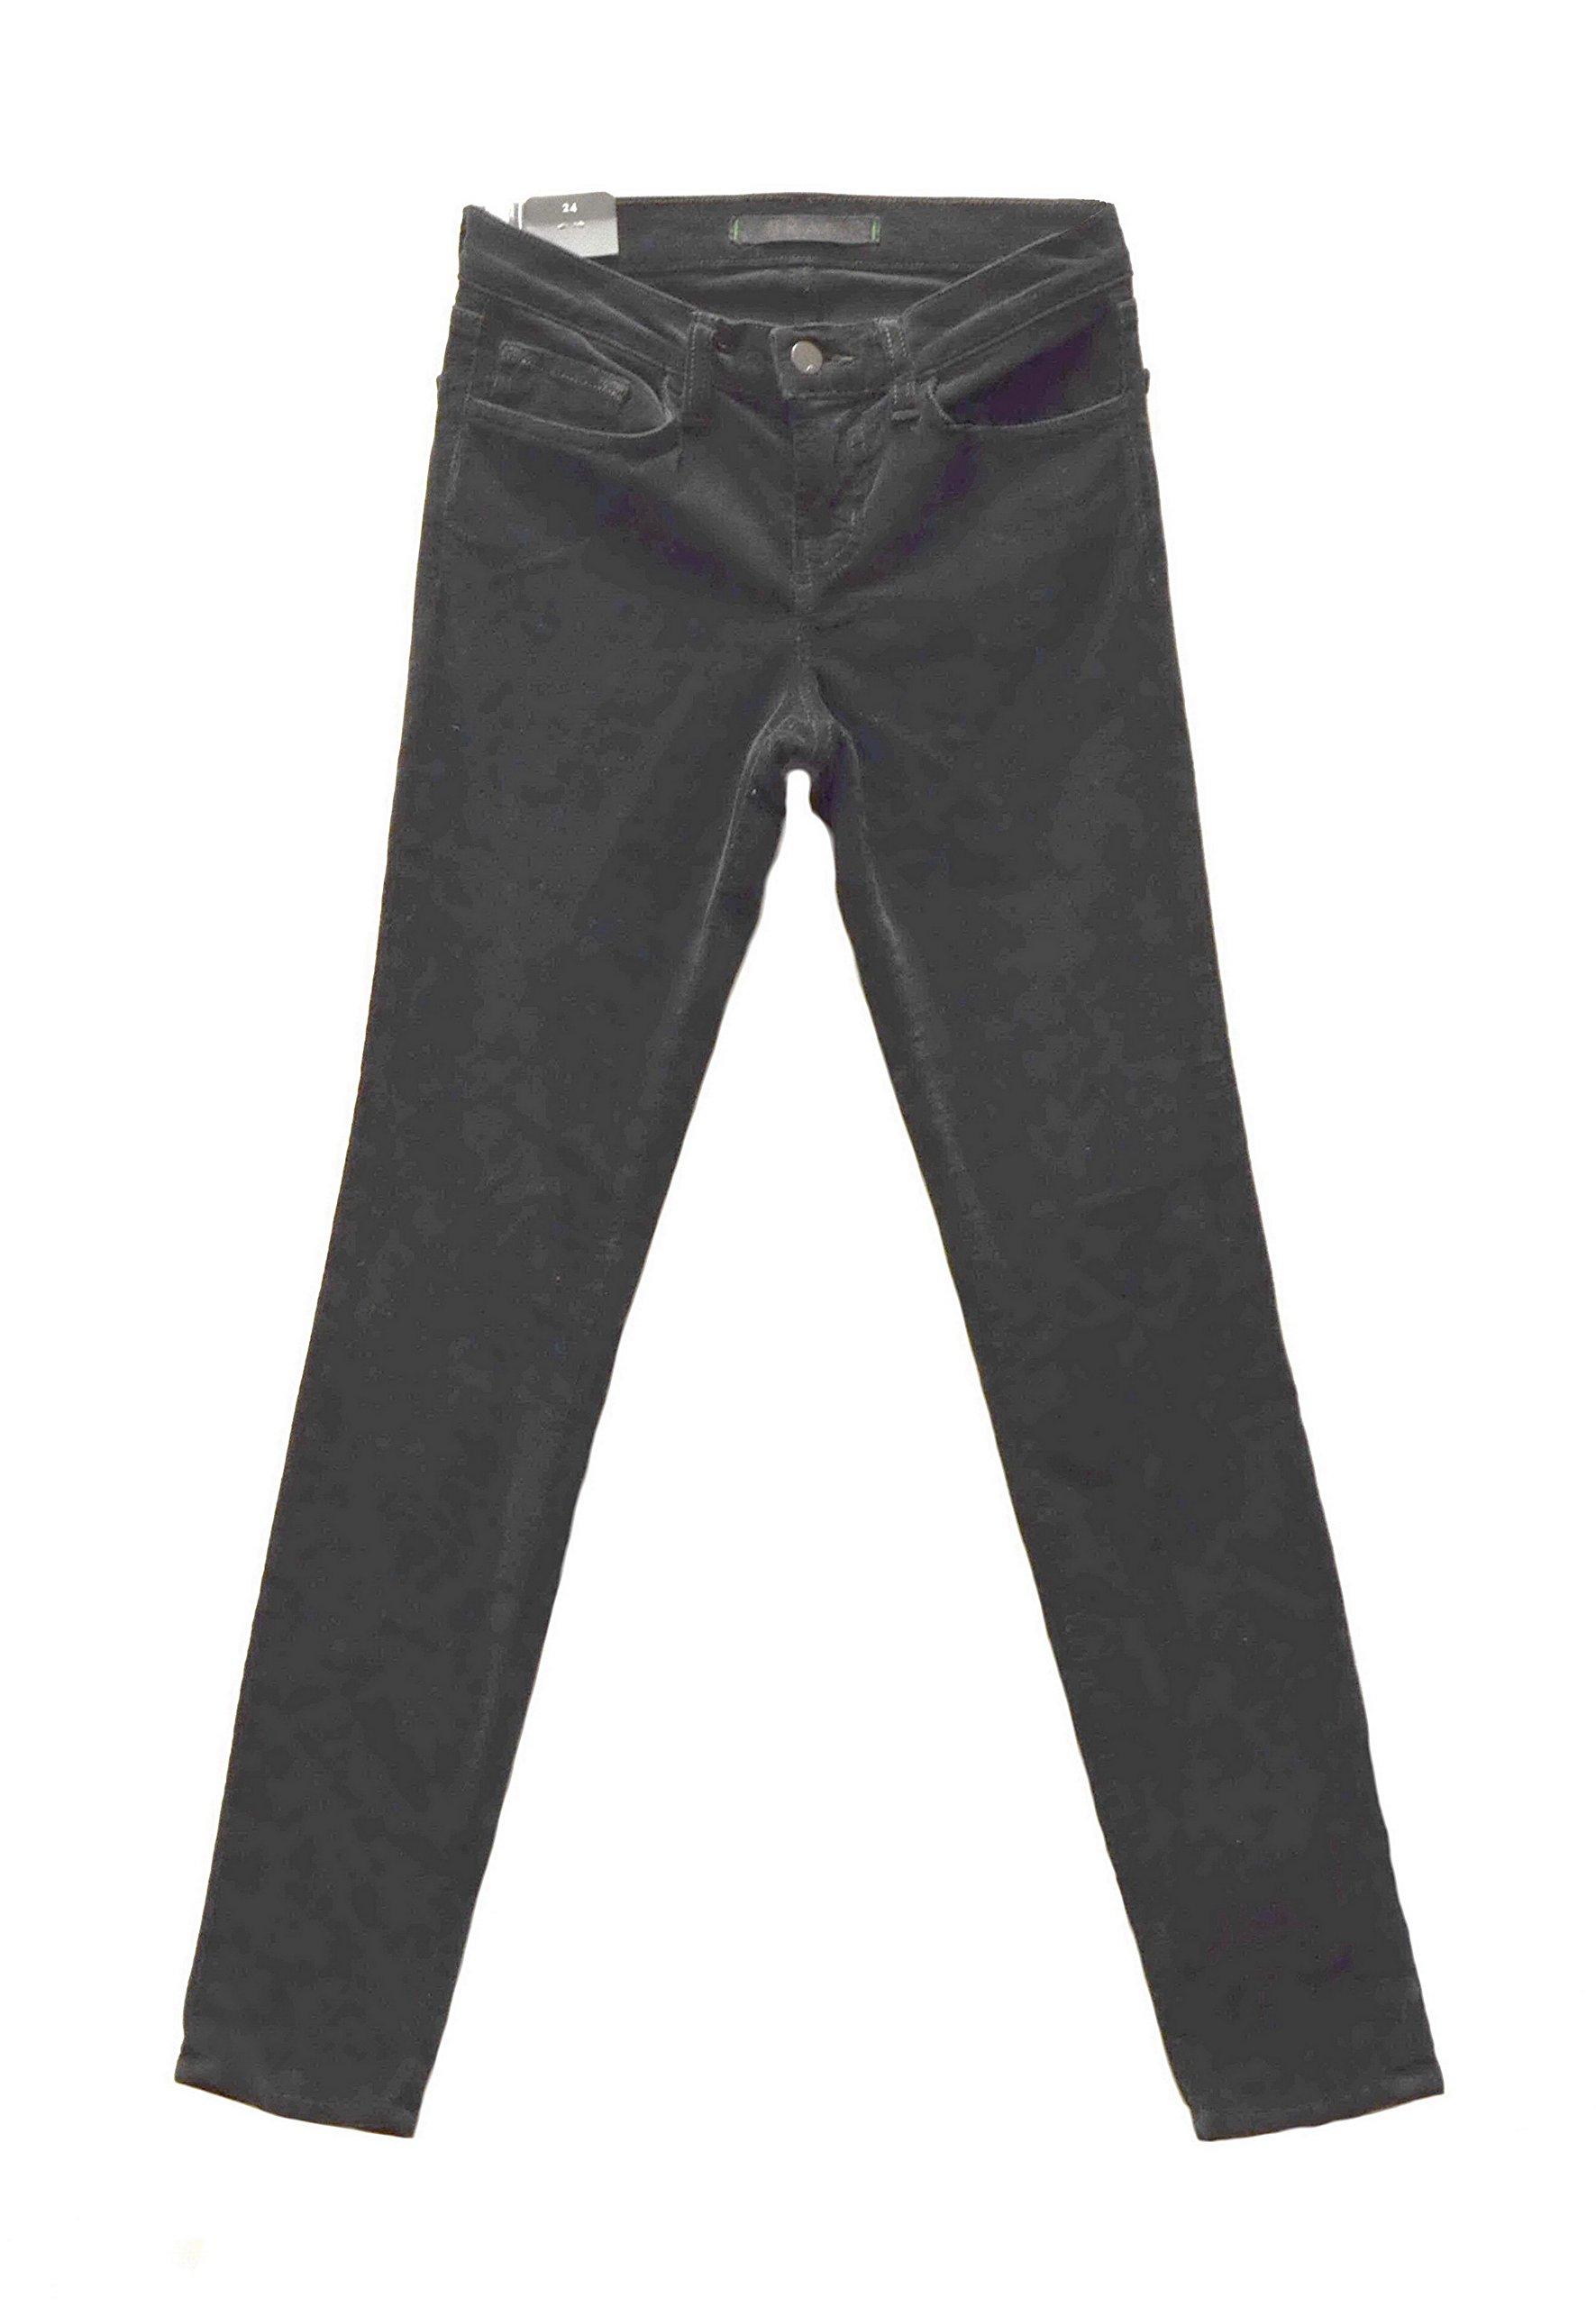 J BRAND Womens Stretch Fit Fine Corduroy Skinny Jeans Pants Sz 24 Black 240574DH